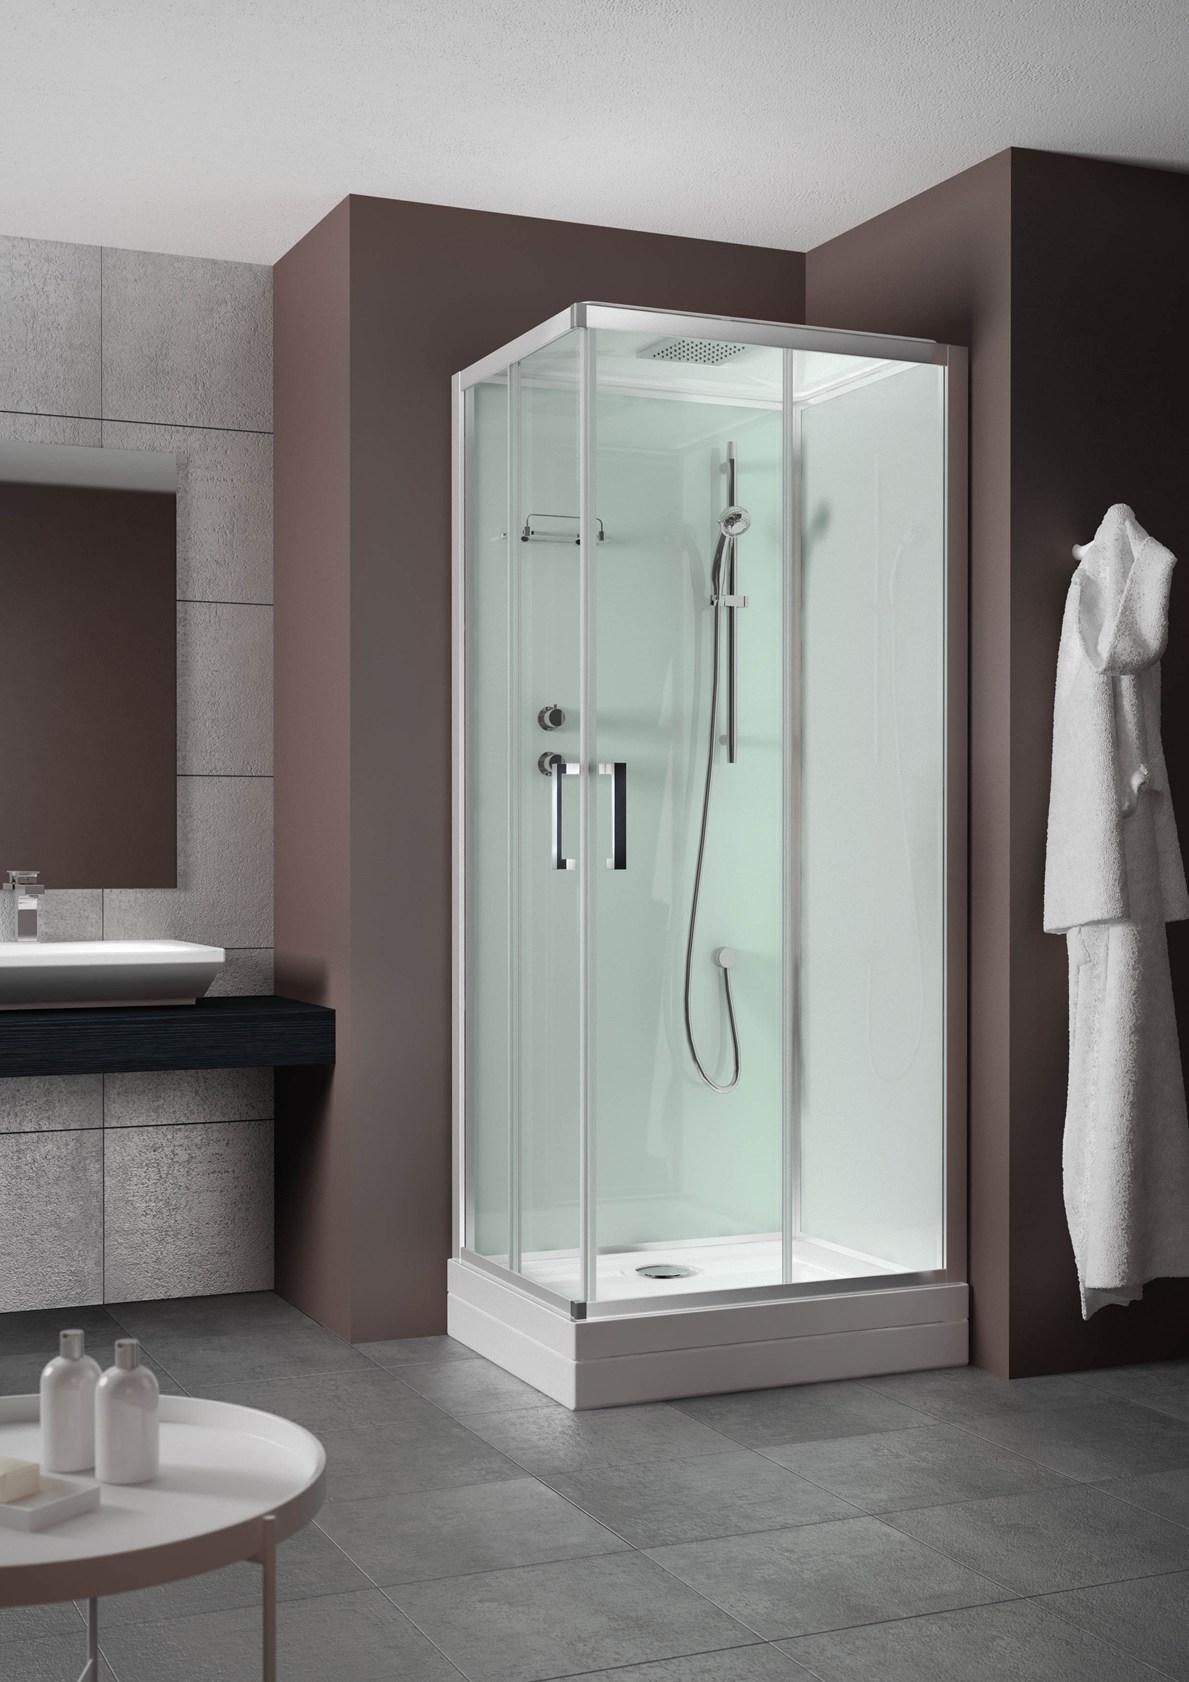 Grandform evobasic cabina doccia 70x90 reversibile - Cabina bagno prefabbricata ...